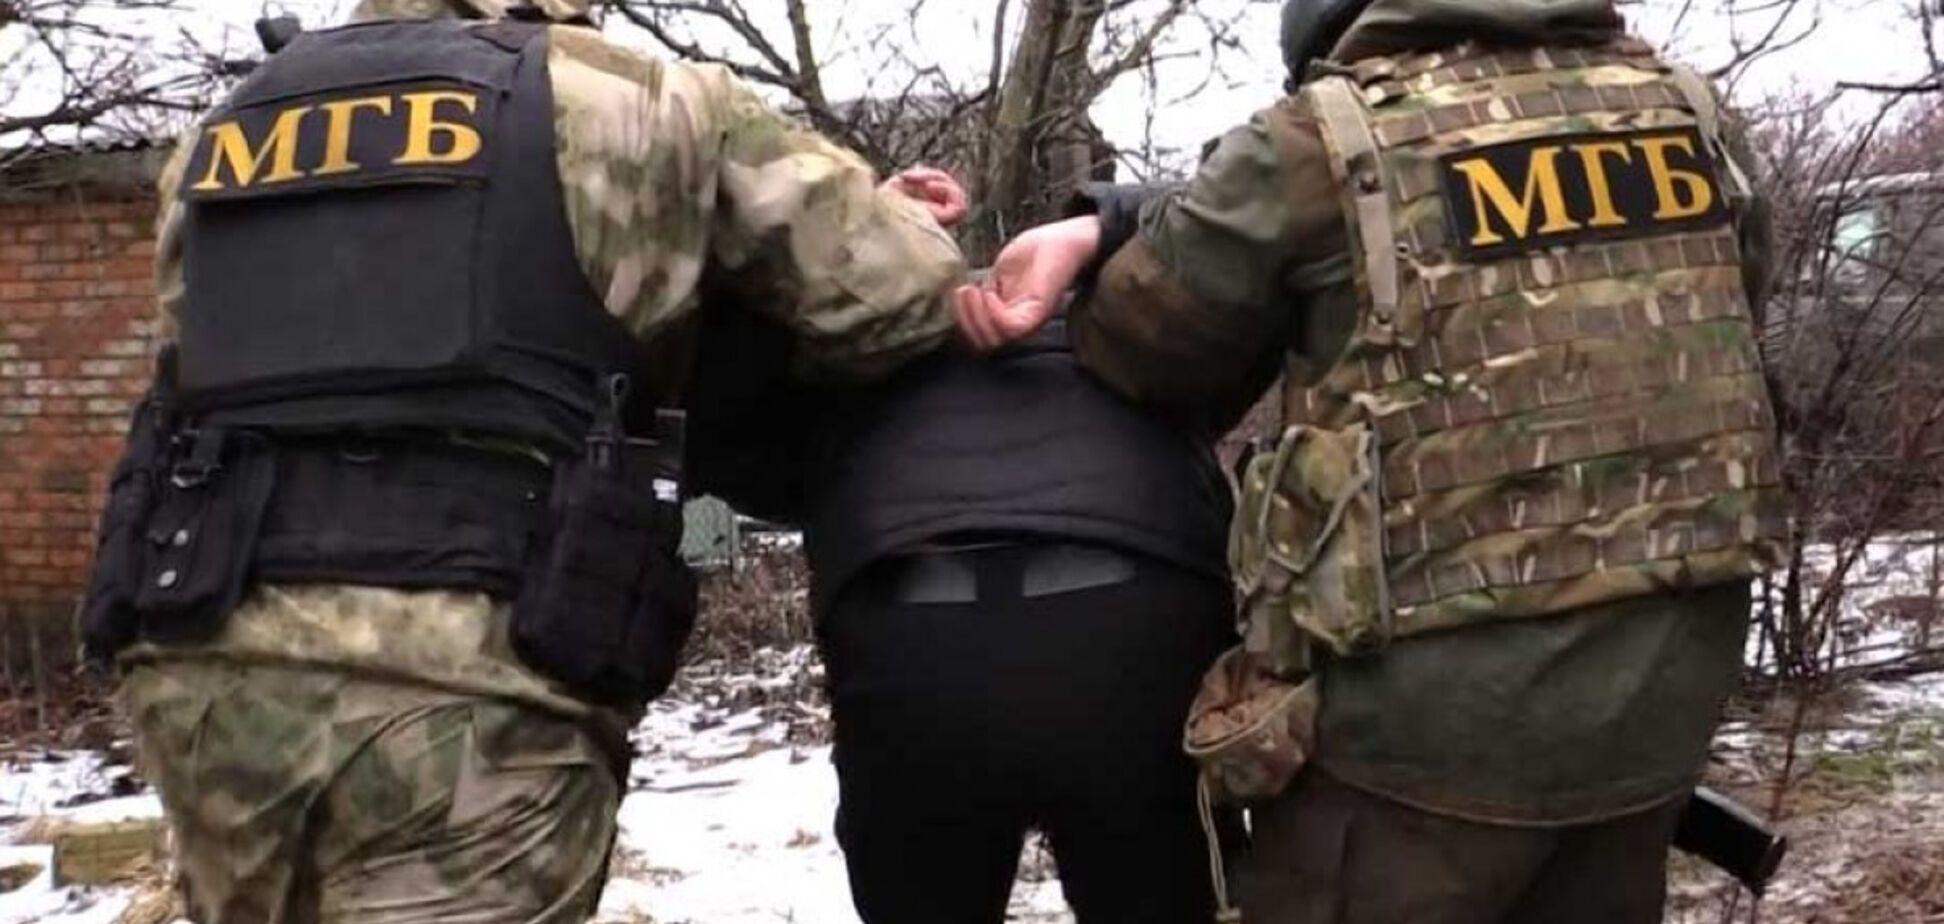 Гаряча лінія 'МГБ ДНР', слухаю вас!